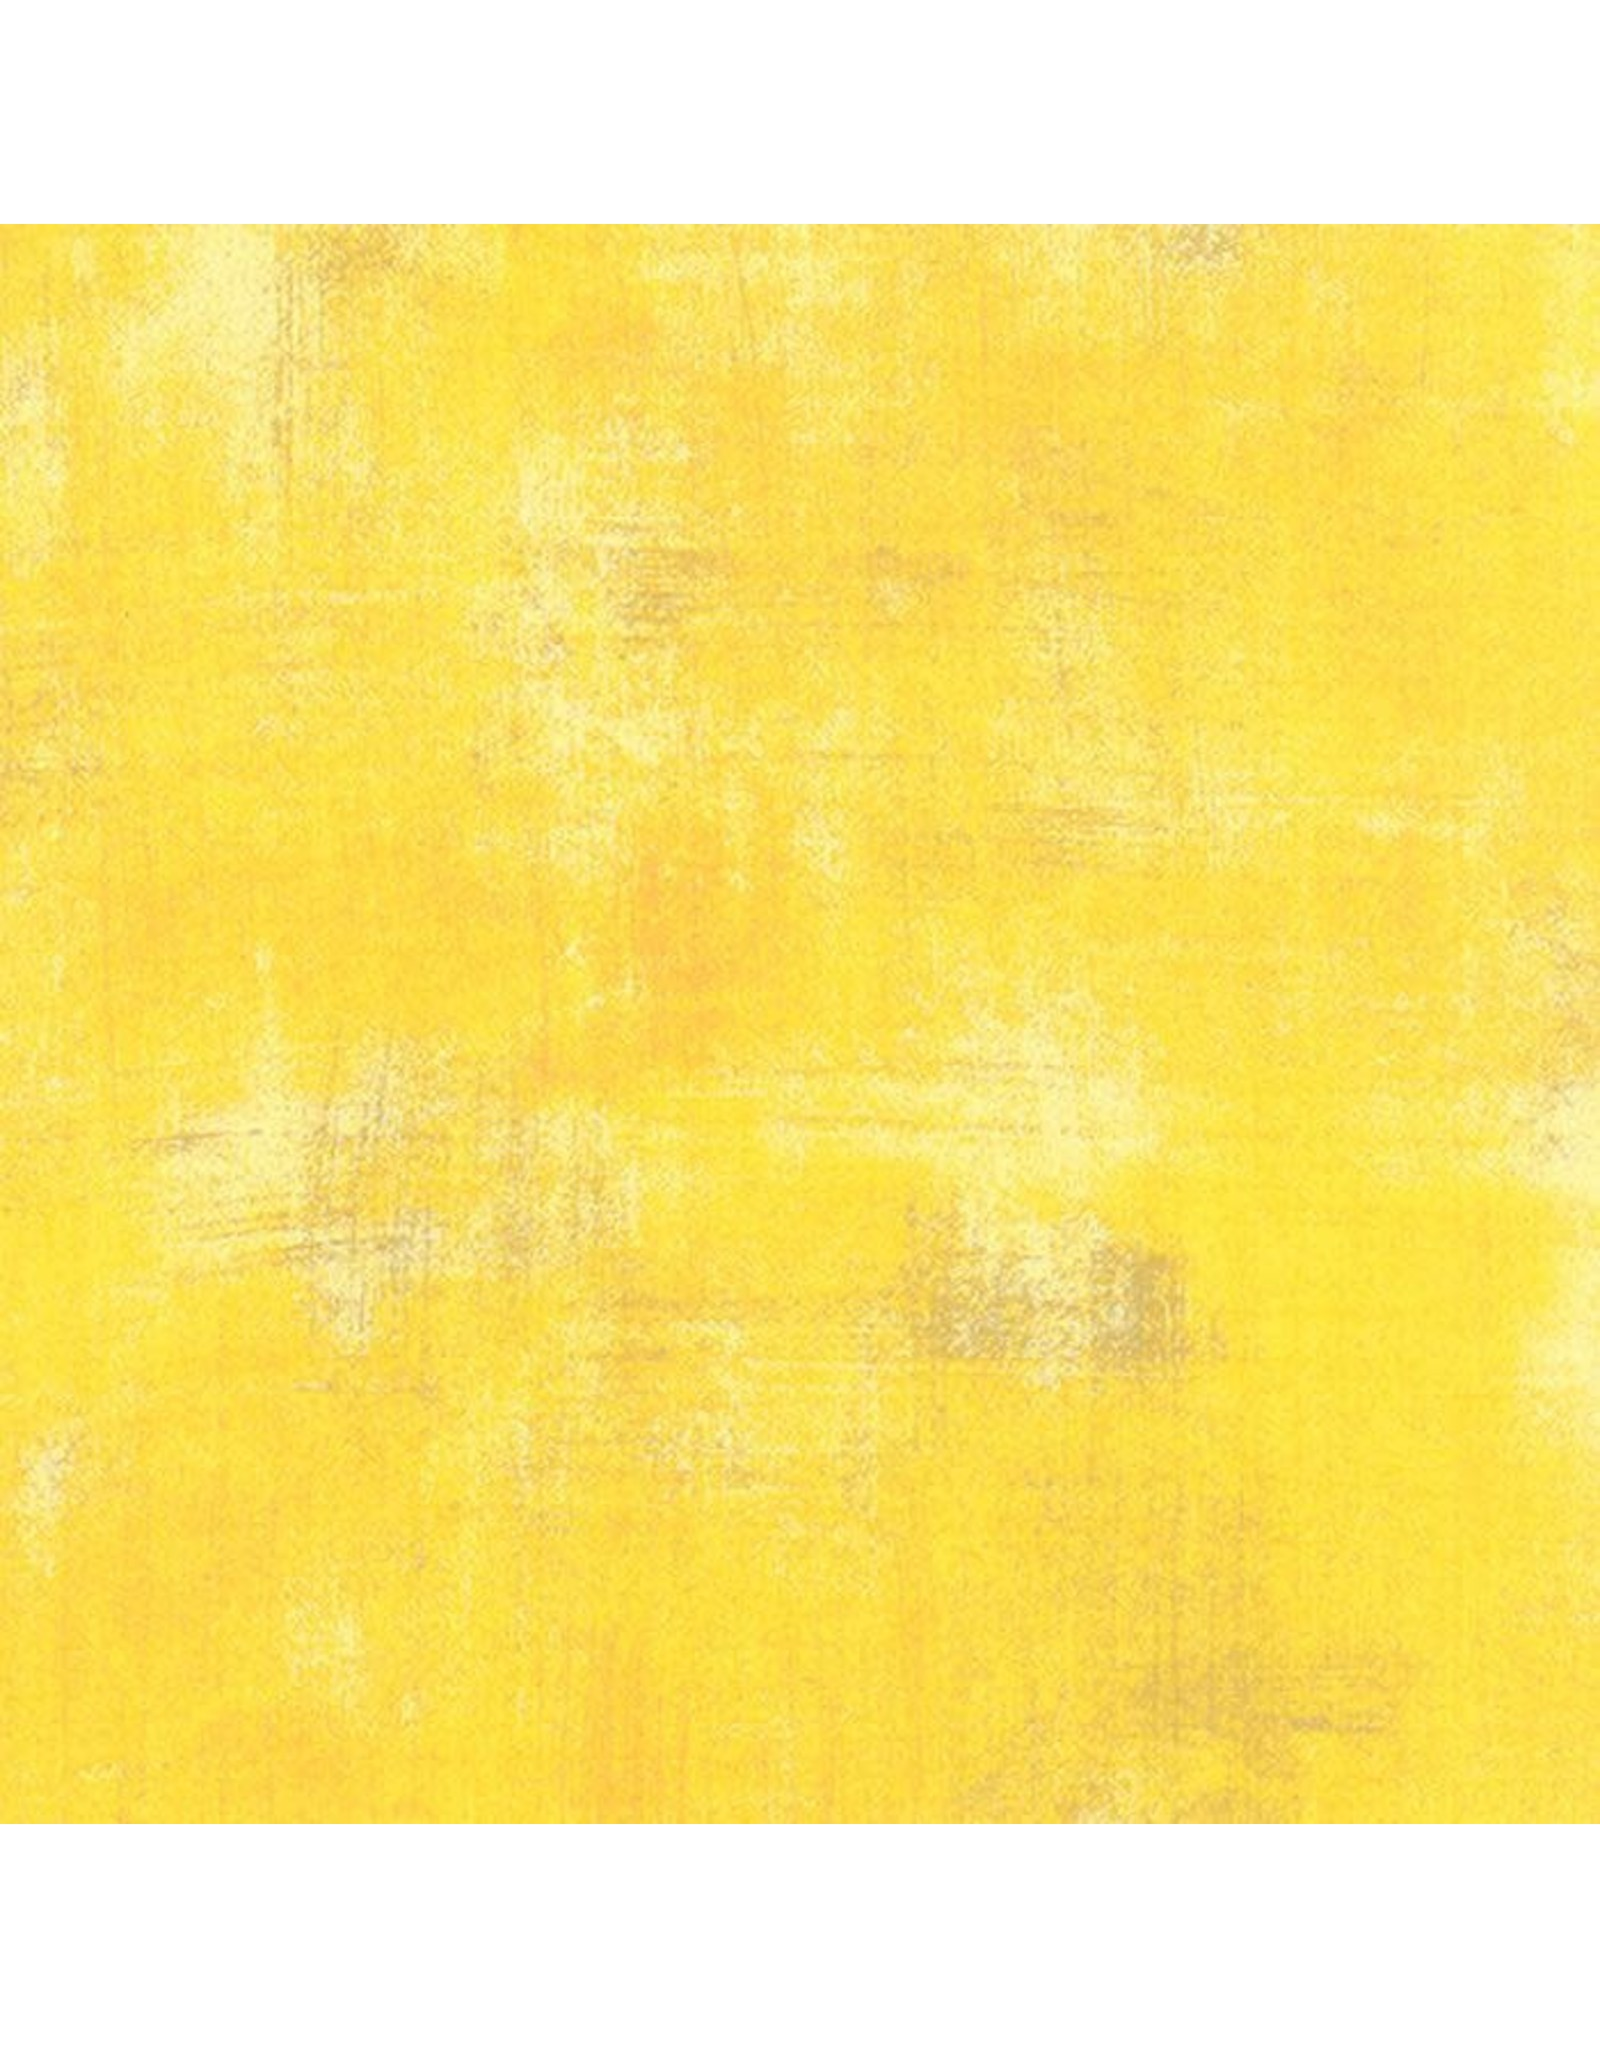 Moda Grunge in Sunflower, Fabric Half-Yards